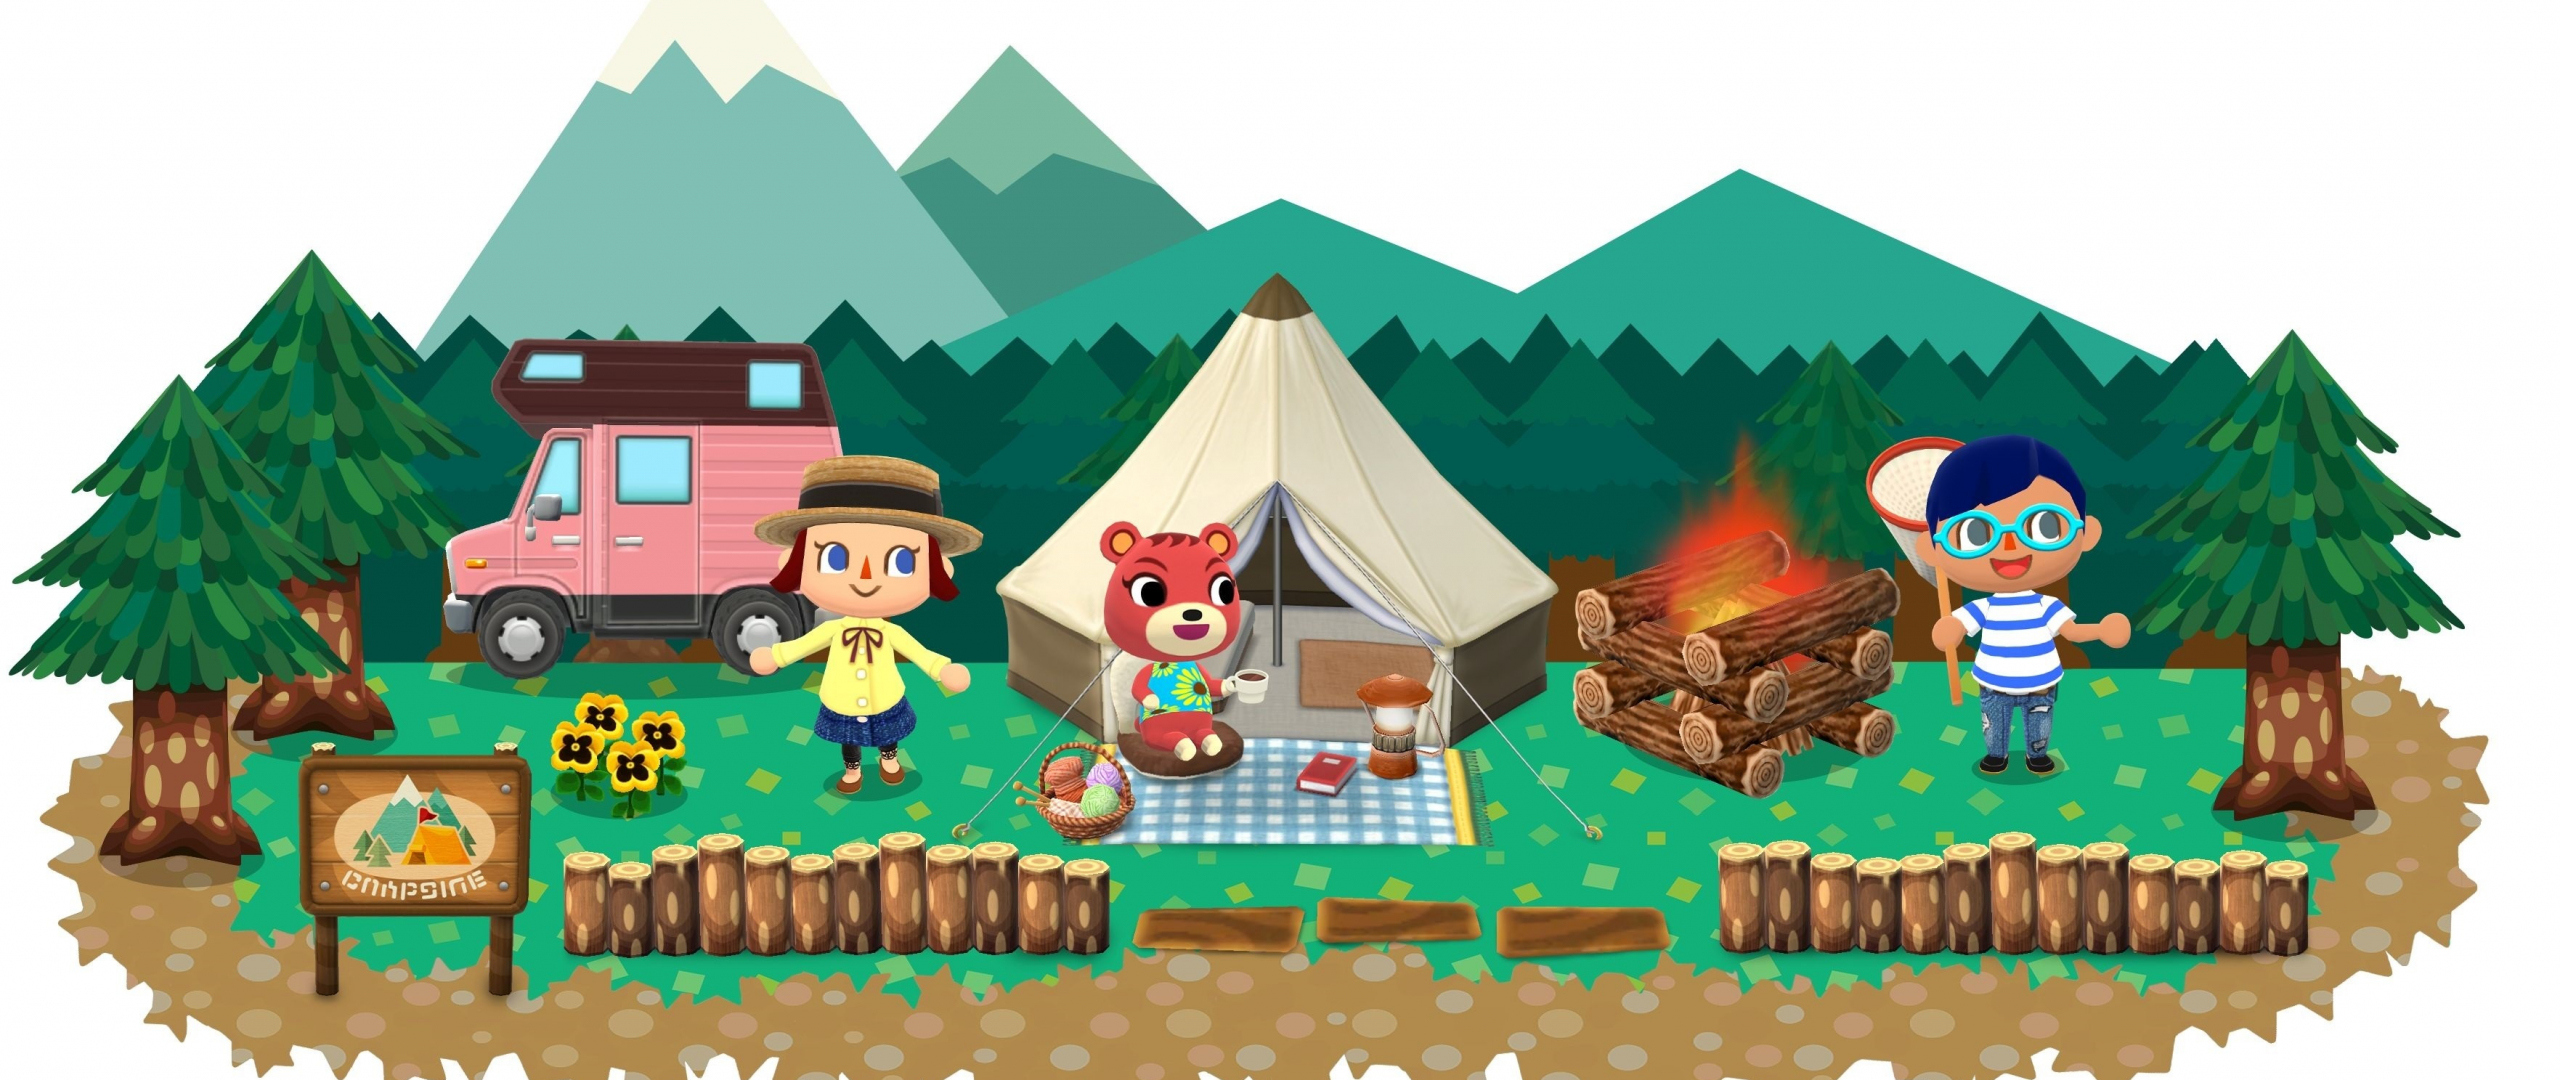 Download 2560x1080 Wallpaper Animal Crossing Pocket Camp Mobile